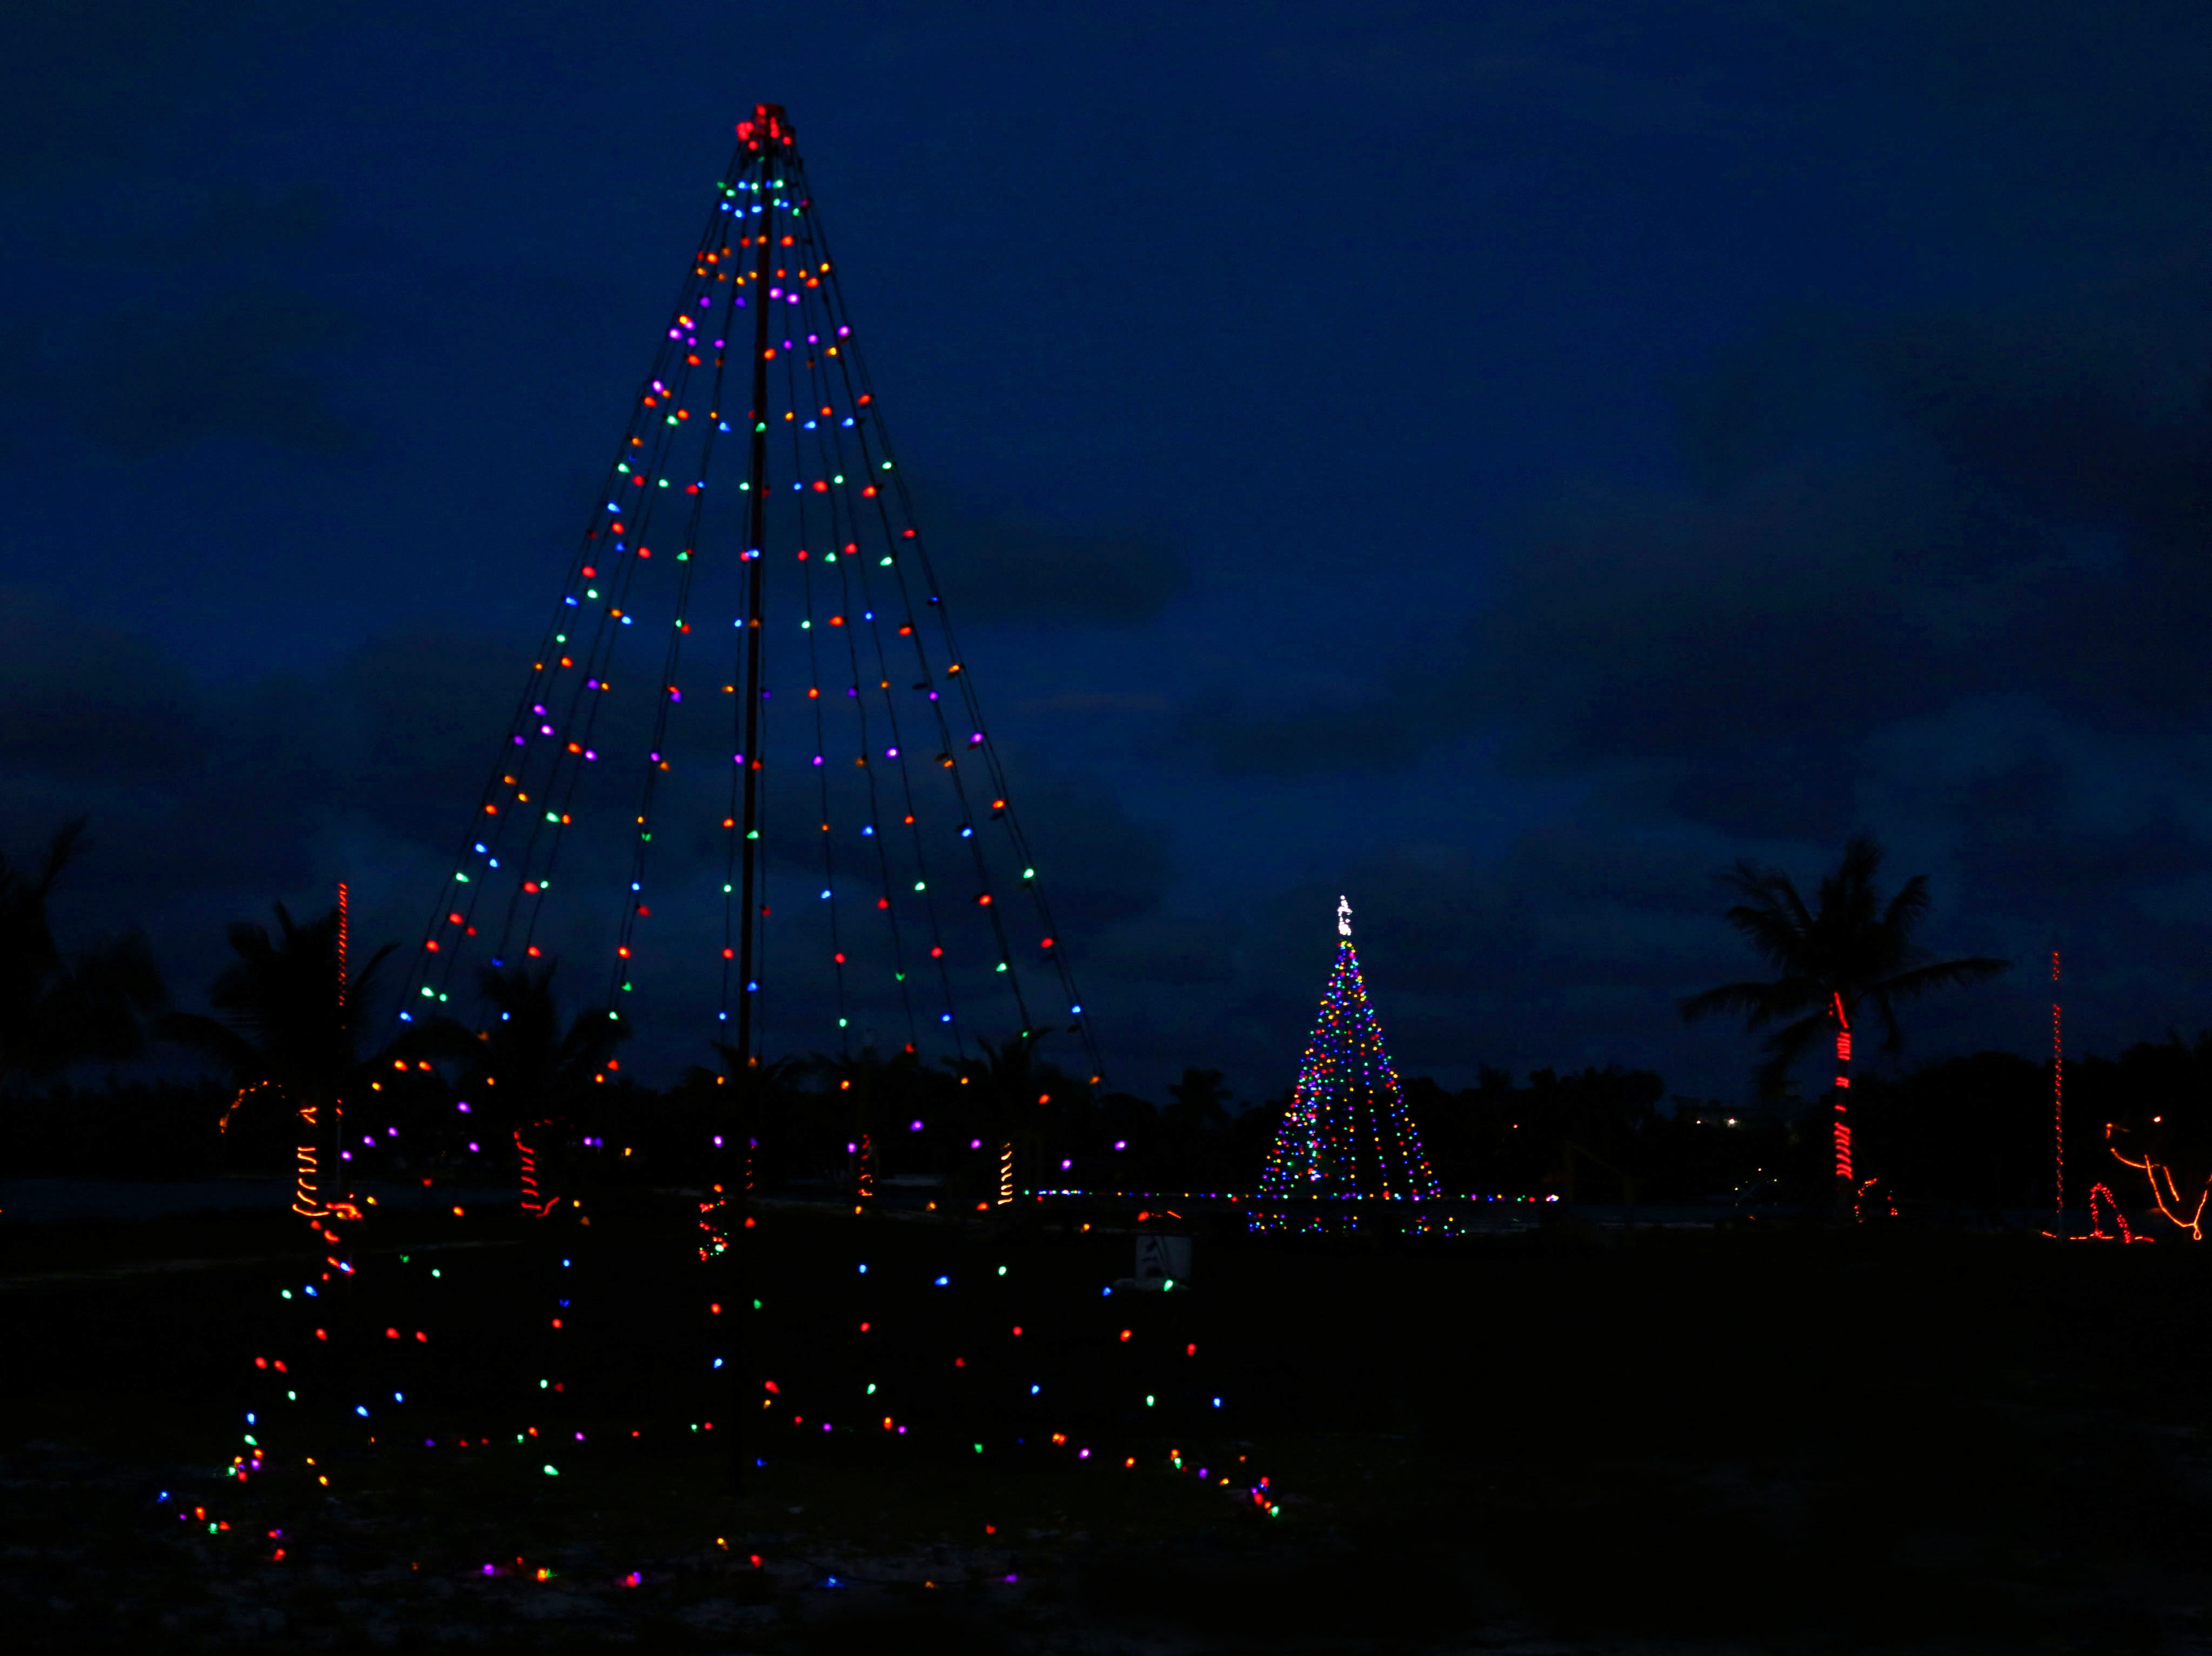 bahamas, abaco, green turtle cay, festival of lights